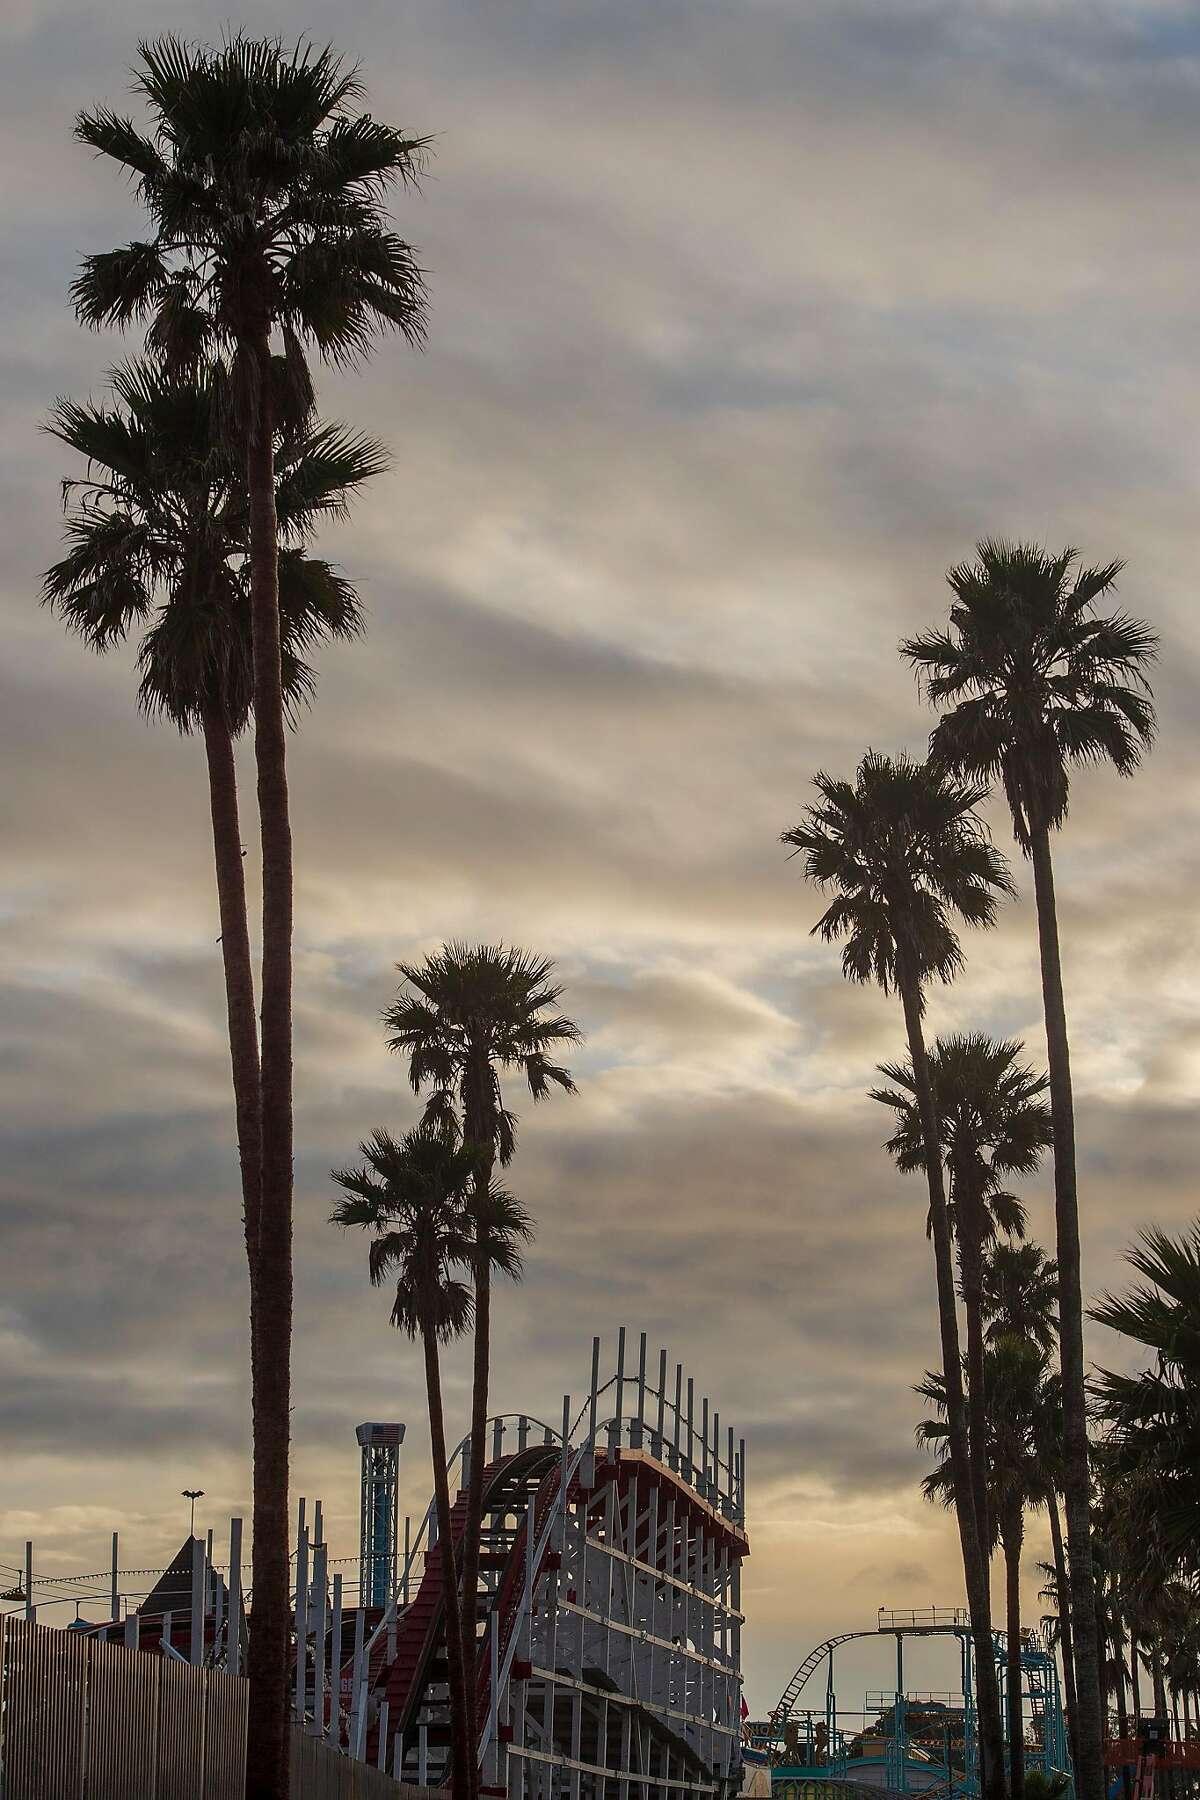 FILE - The Santa Cruz Beach Boardwalk in Santa Cruz, Calif. on April 5, 2019.